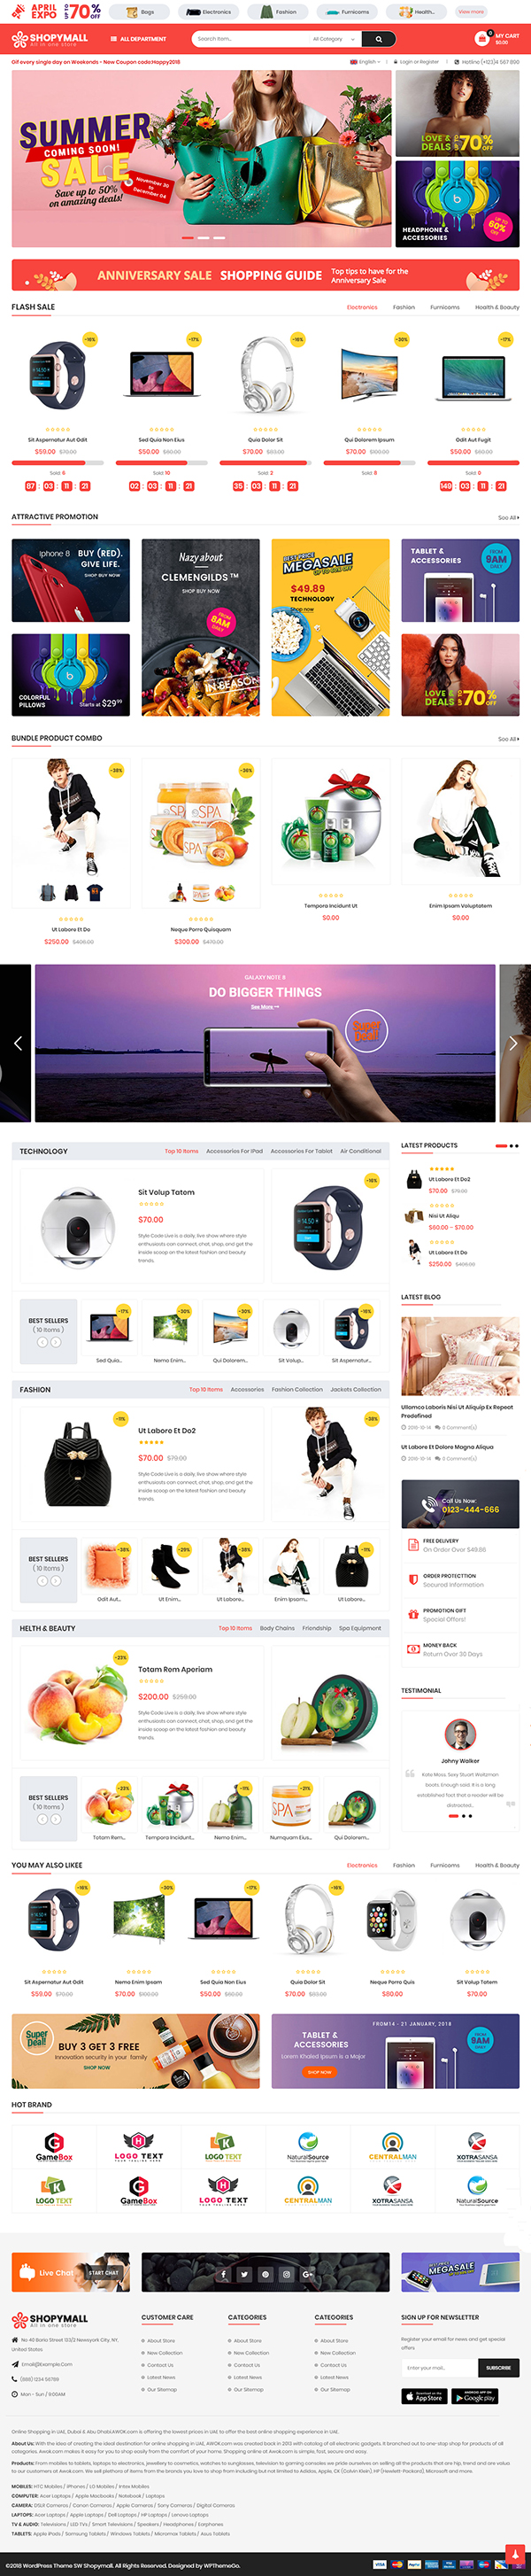 ShopyMall - MarketPlace WP Theme